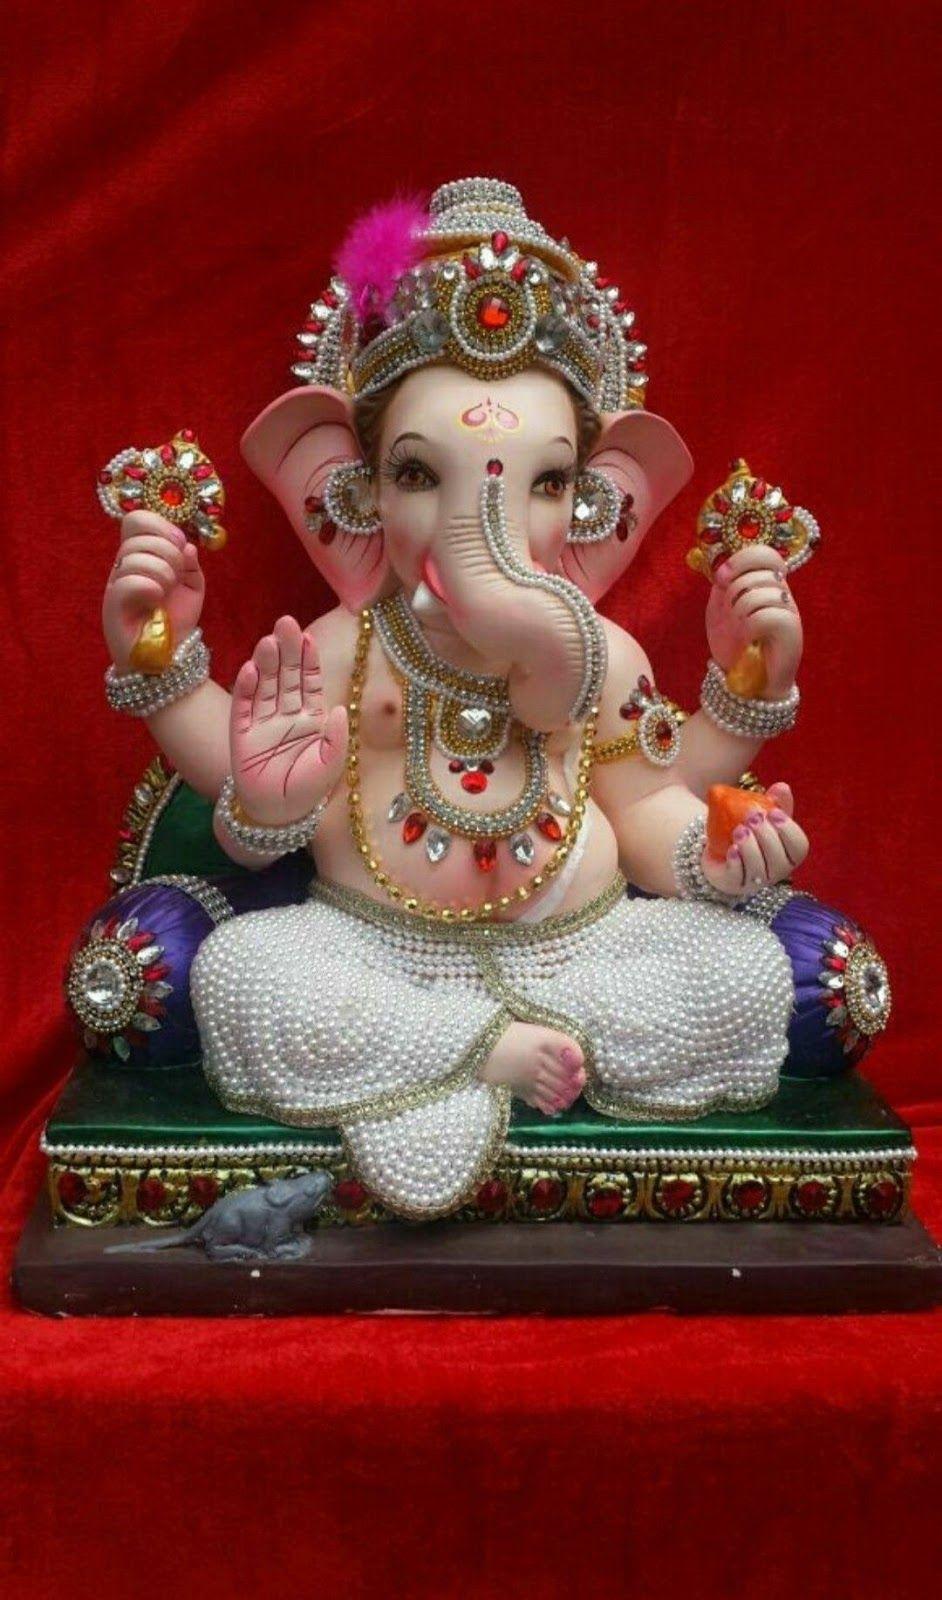 310 Ganpati Bappa Images Free Download Full Hd Pics Photo Gallery And Wallpapers 2019 Happy New Year 2020 Ganesha Pictures Ganesh Bhagwan Baby Ganesha